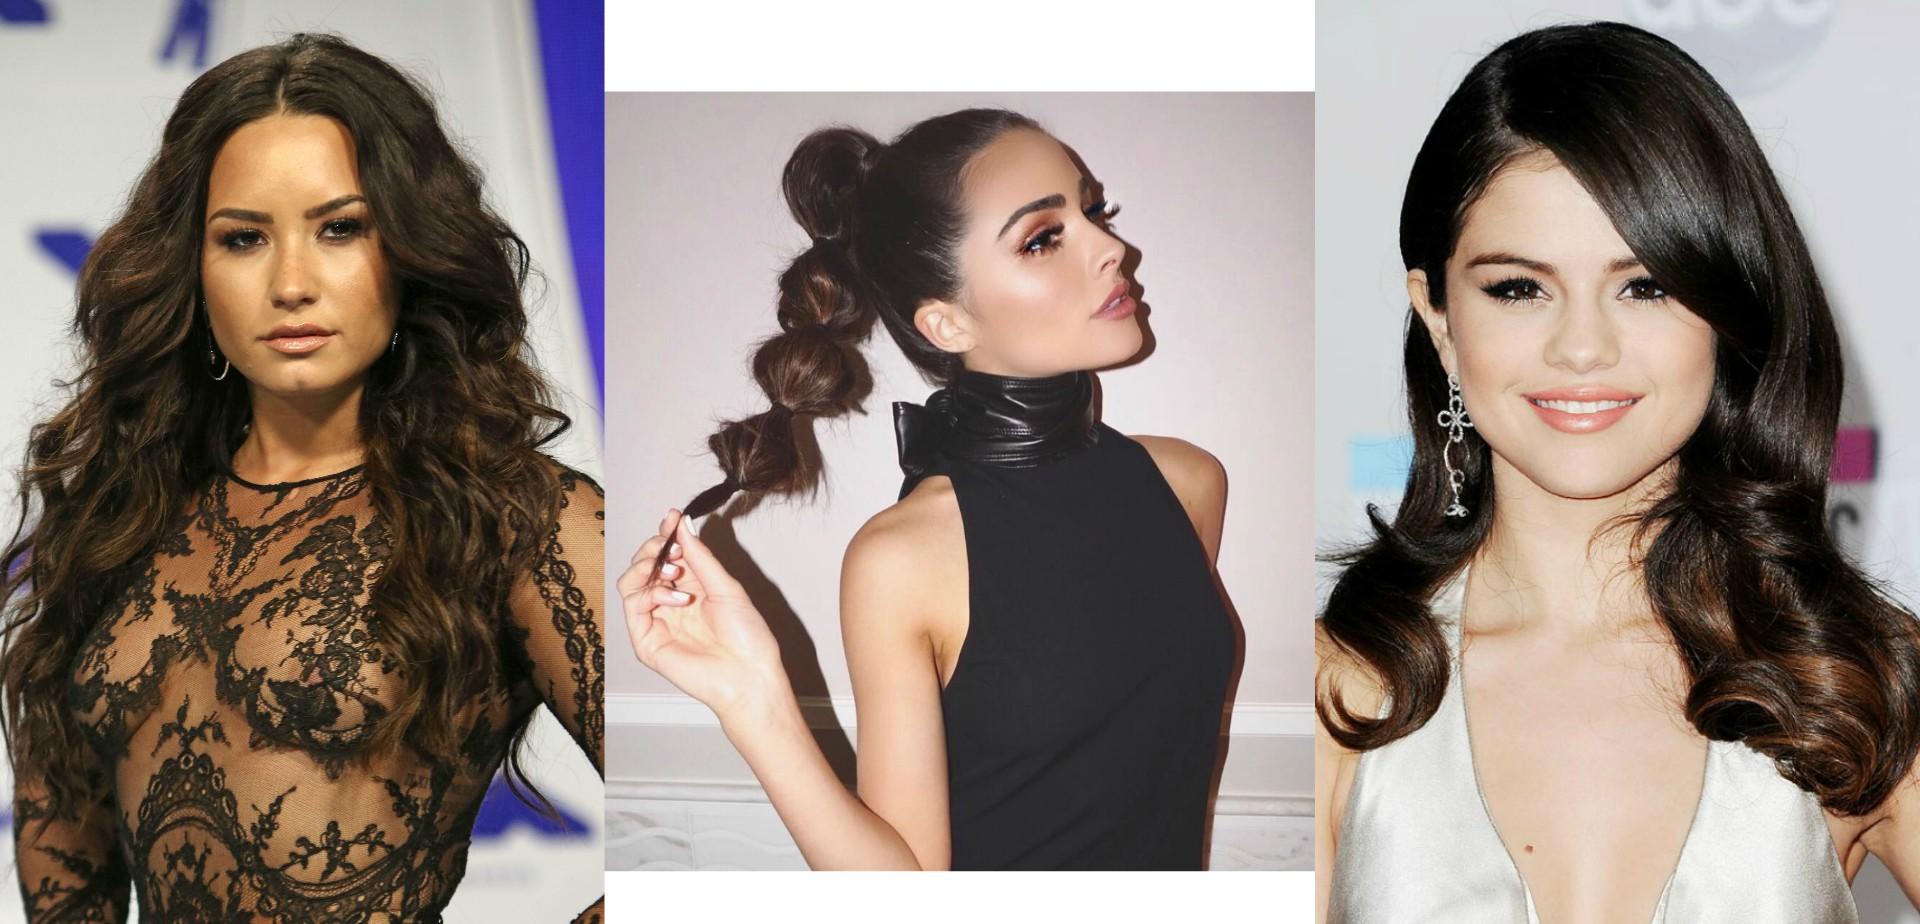 15 Coafuri Pentru Revelionul 2018 Care Te Vor Inspira Glamourro